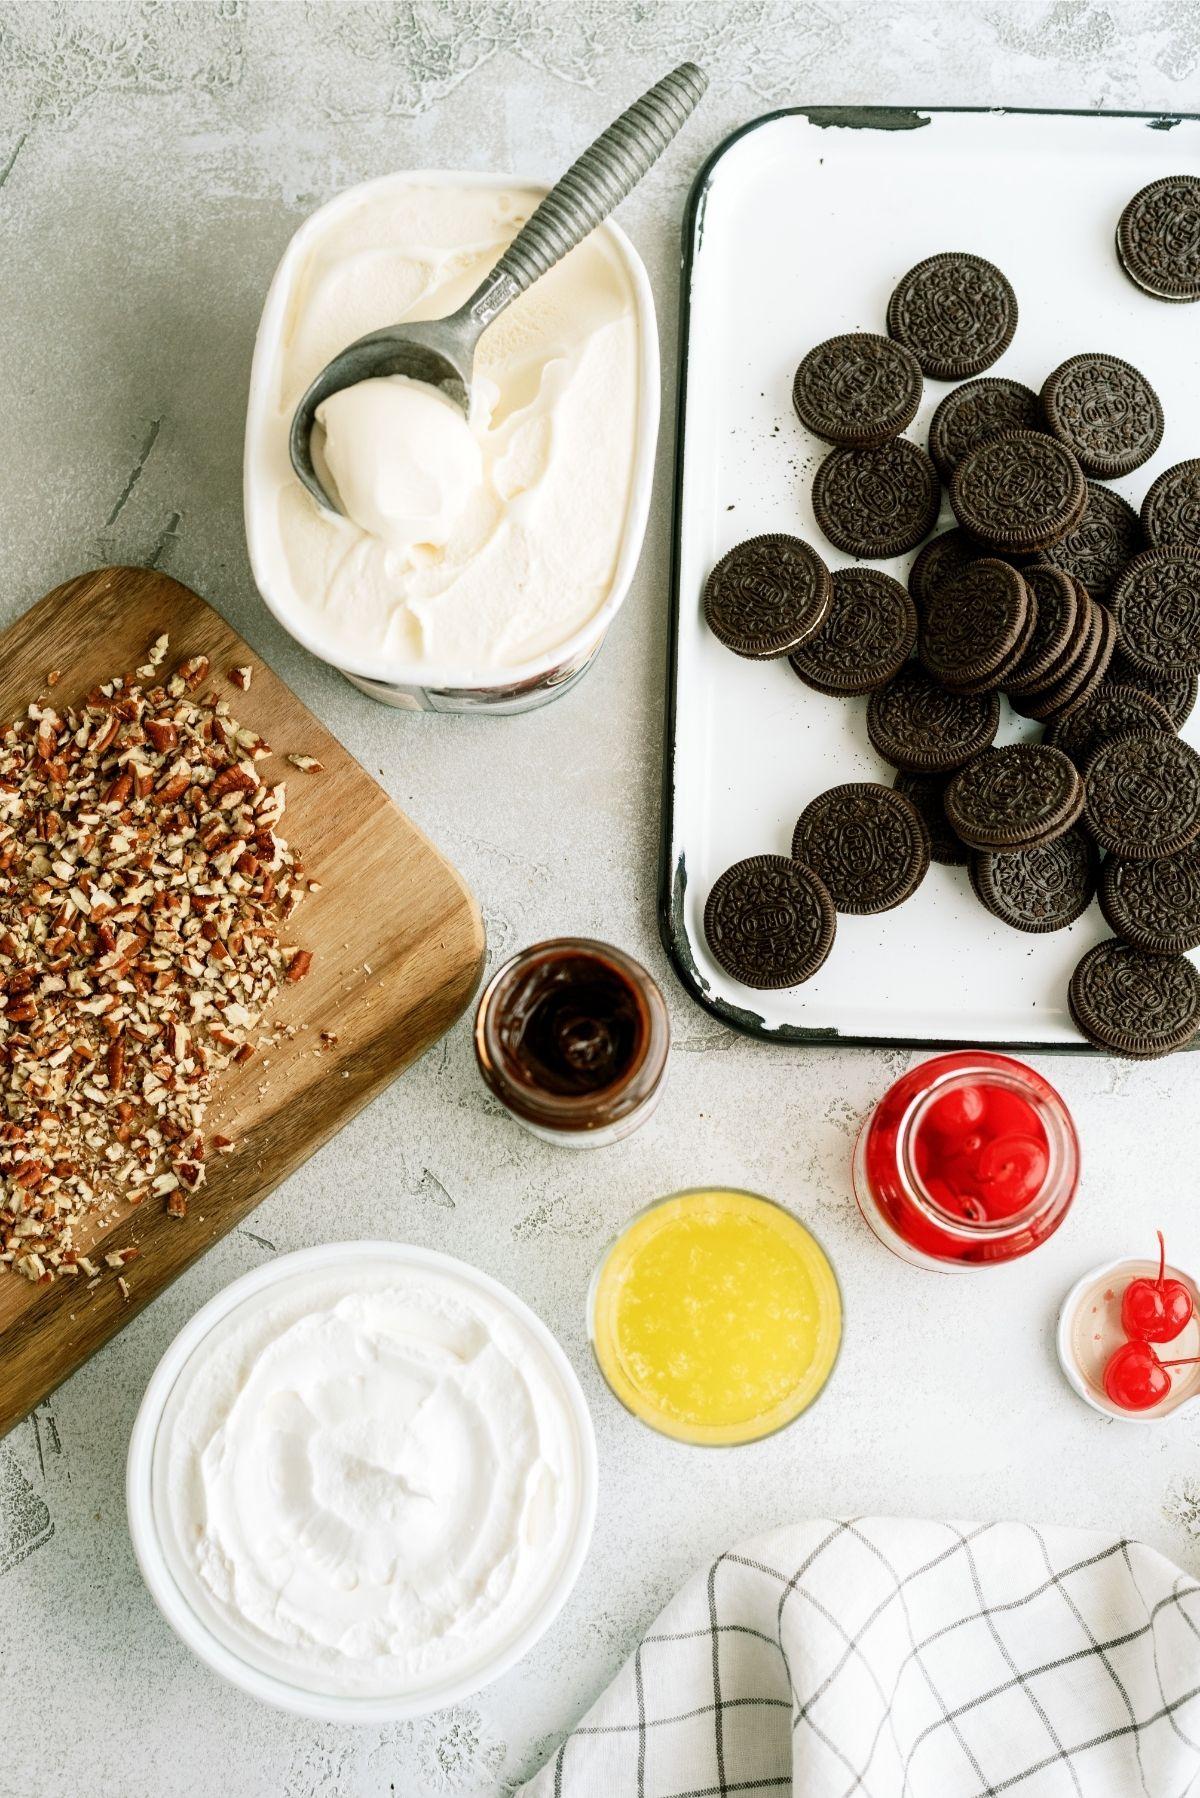 Ingredients for No Bake Mississippi Mud Ice Cream Pie